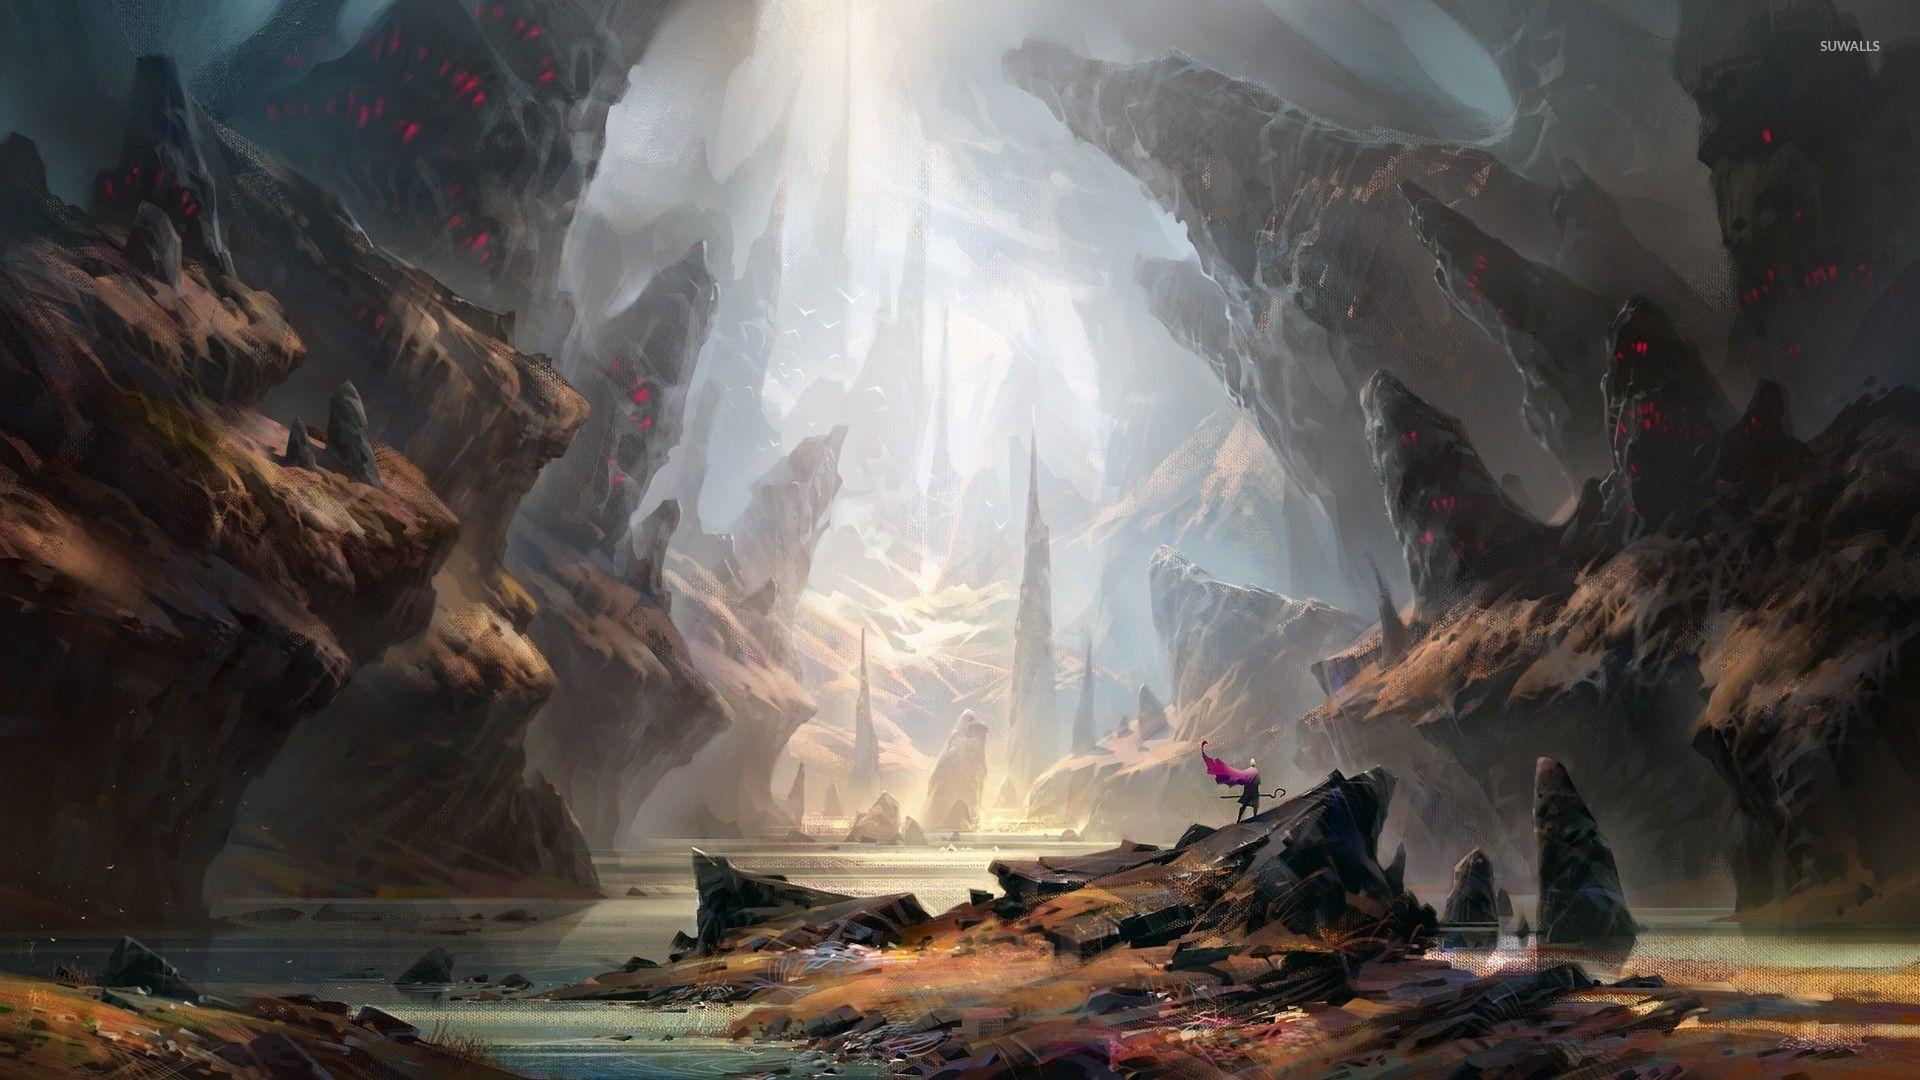 Warrior Under The Light In Cave Wallpaper